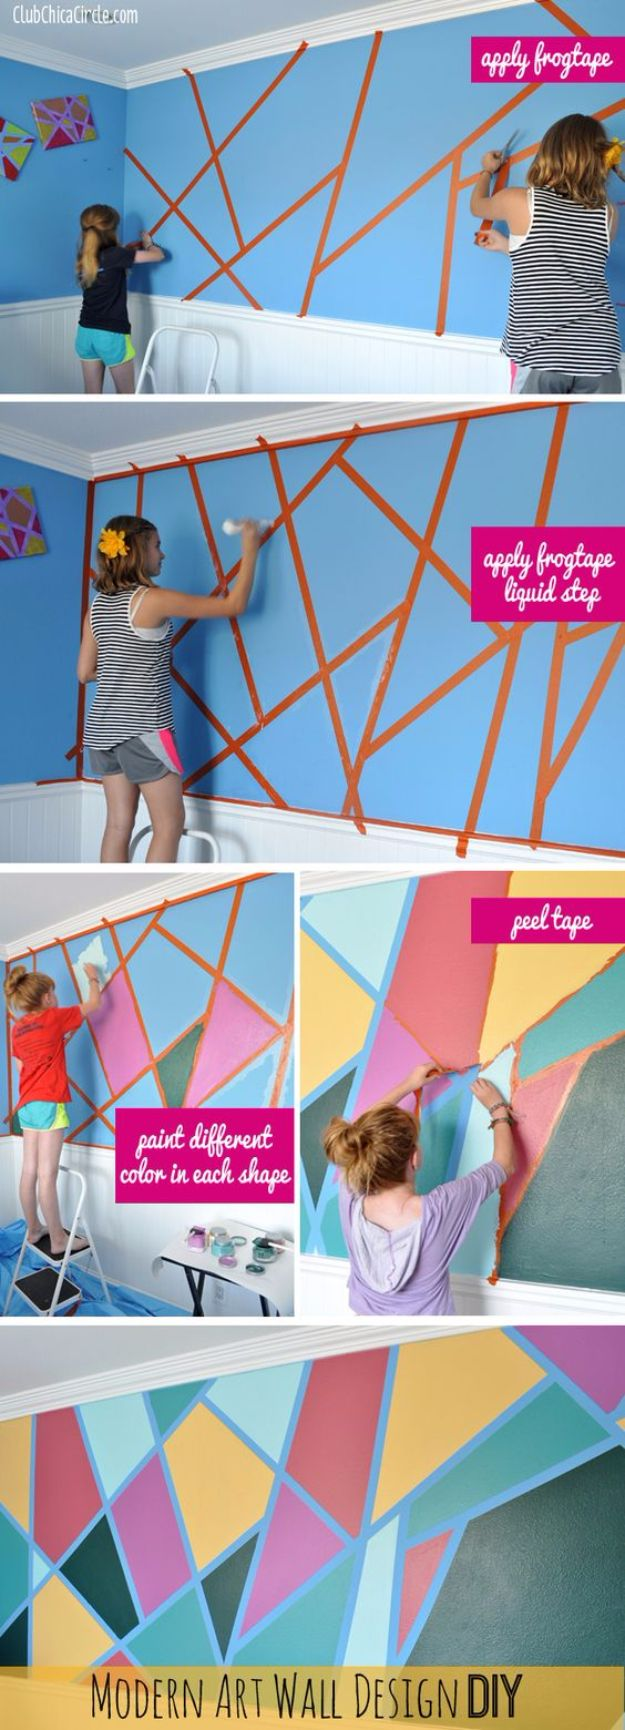 34 Cool Ways To Paint Walls Diy Wall